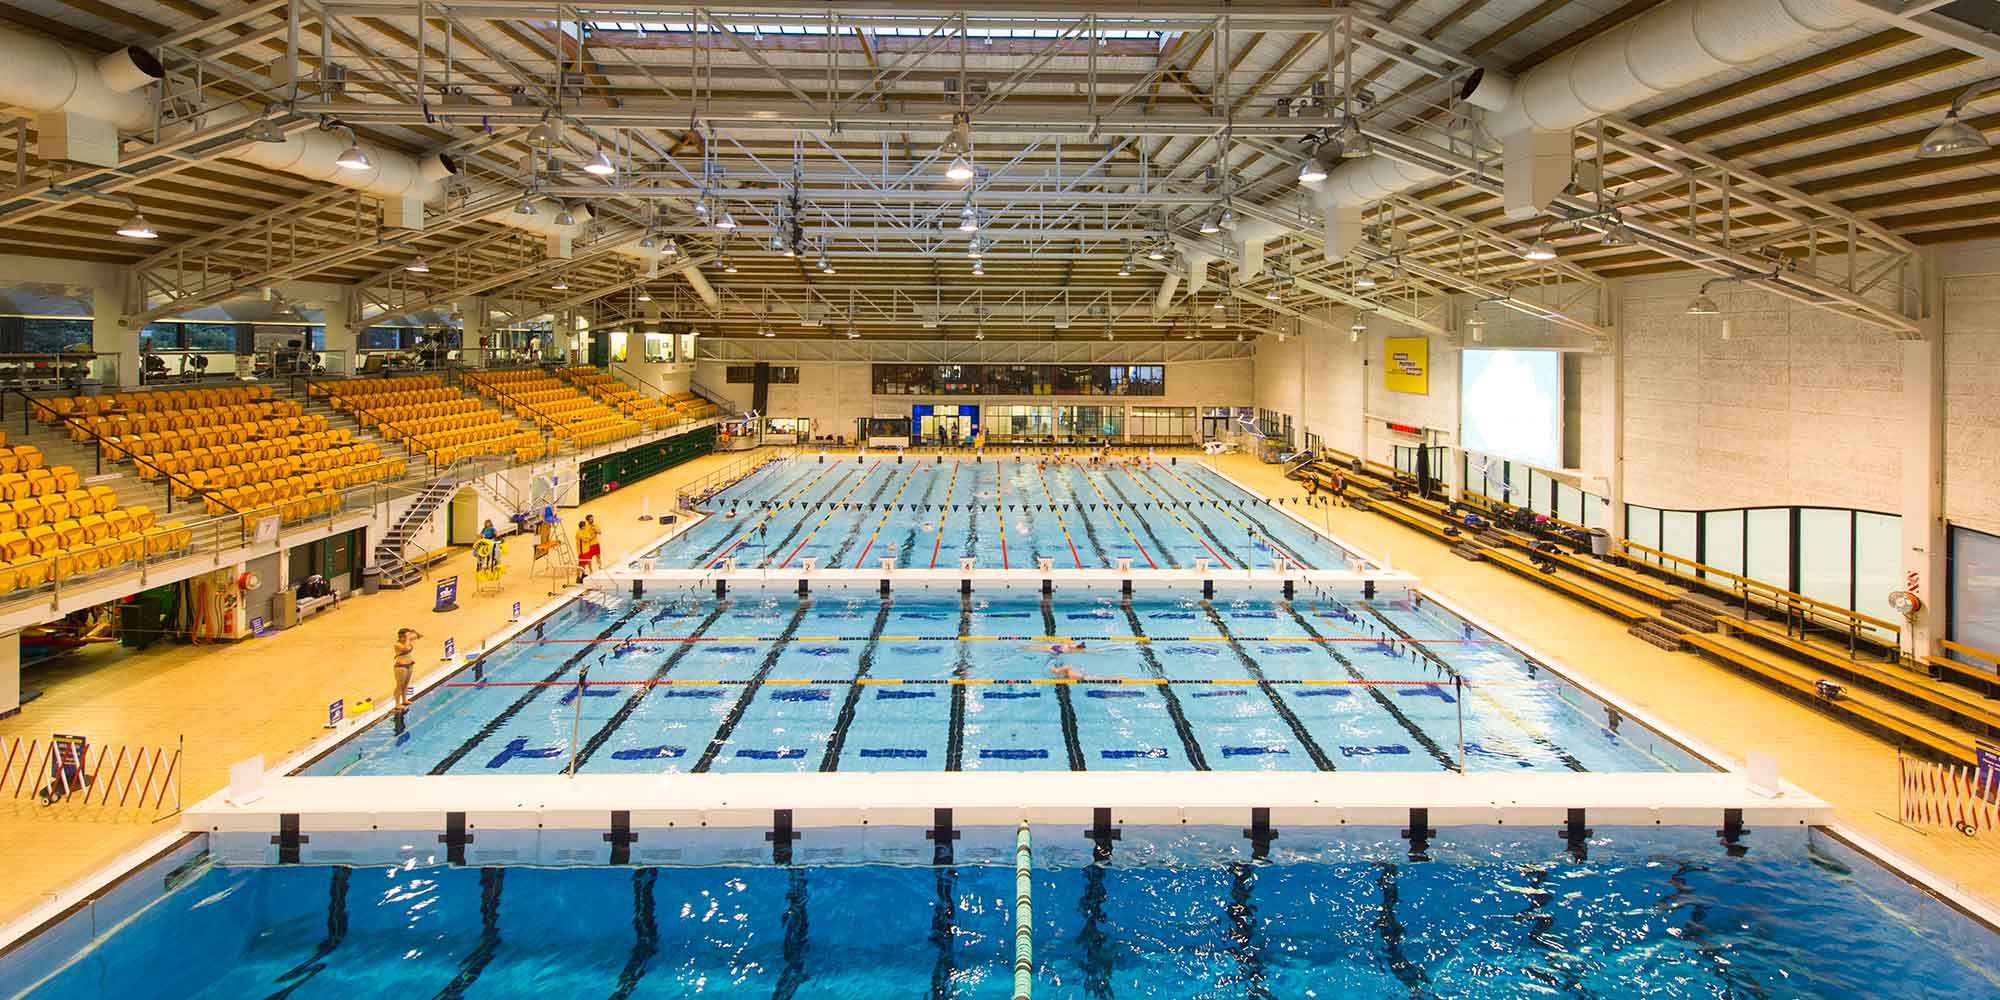 Main pool at WRAC.